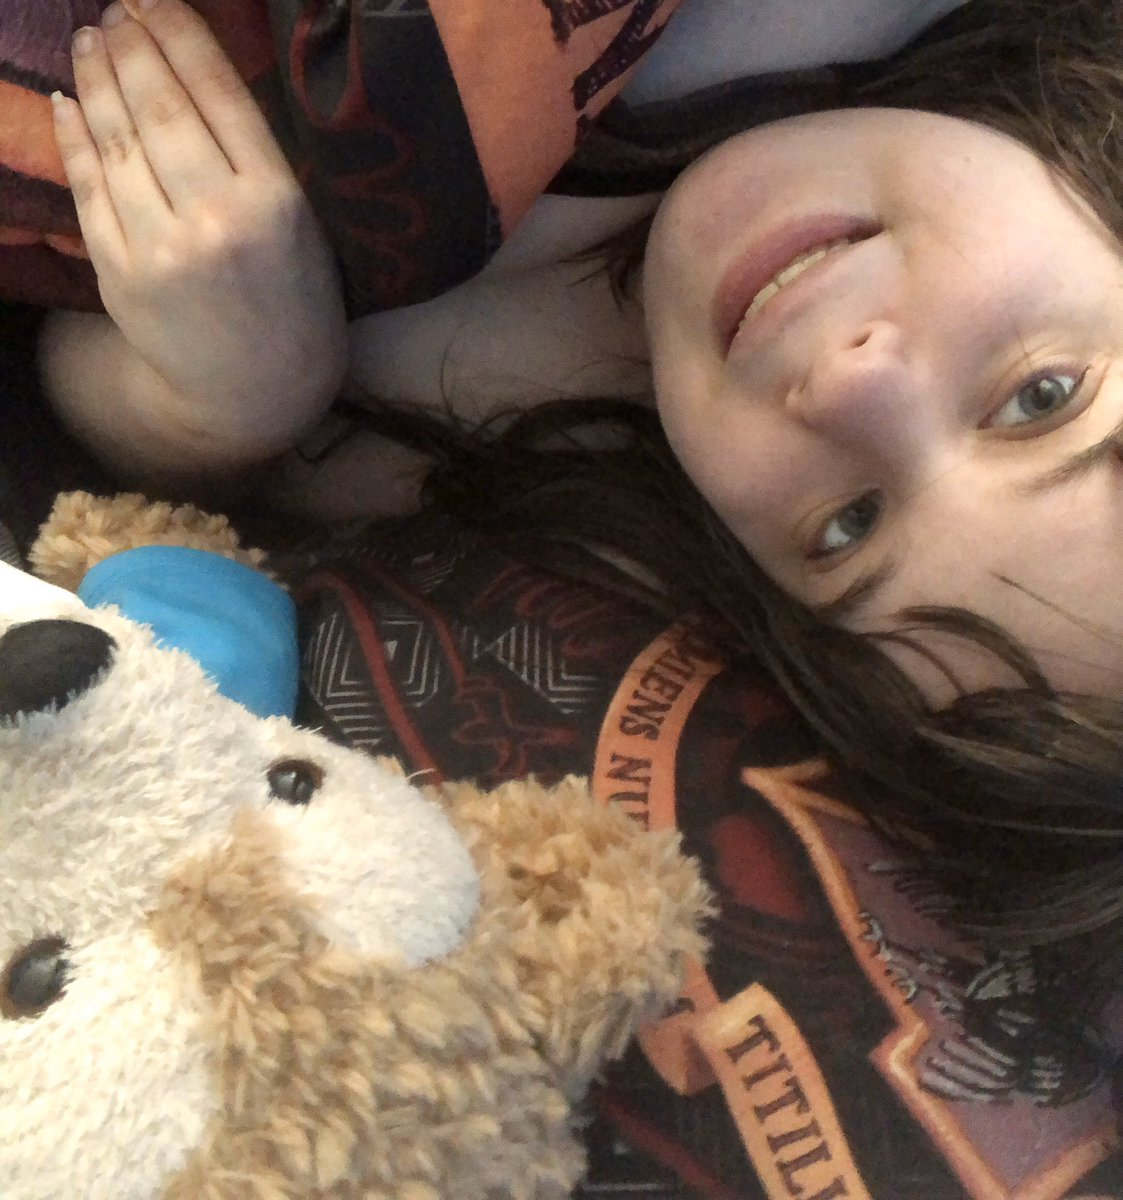 Just a happy sweet princess with her favorite bear 🧸💙🧸 #selfie #beautiful #BestFriends #duffythedisneybear #havingfun #disneylife